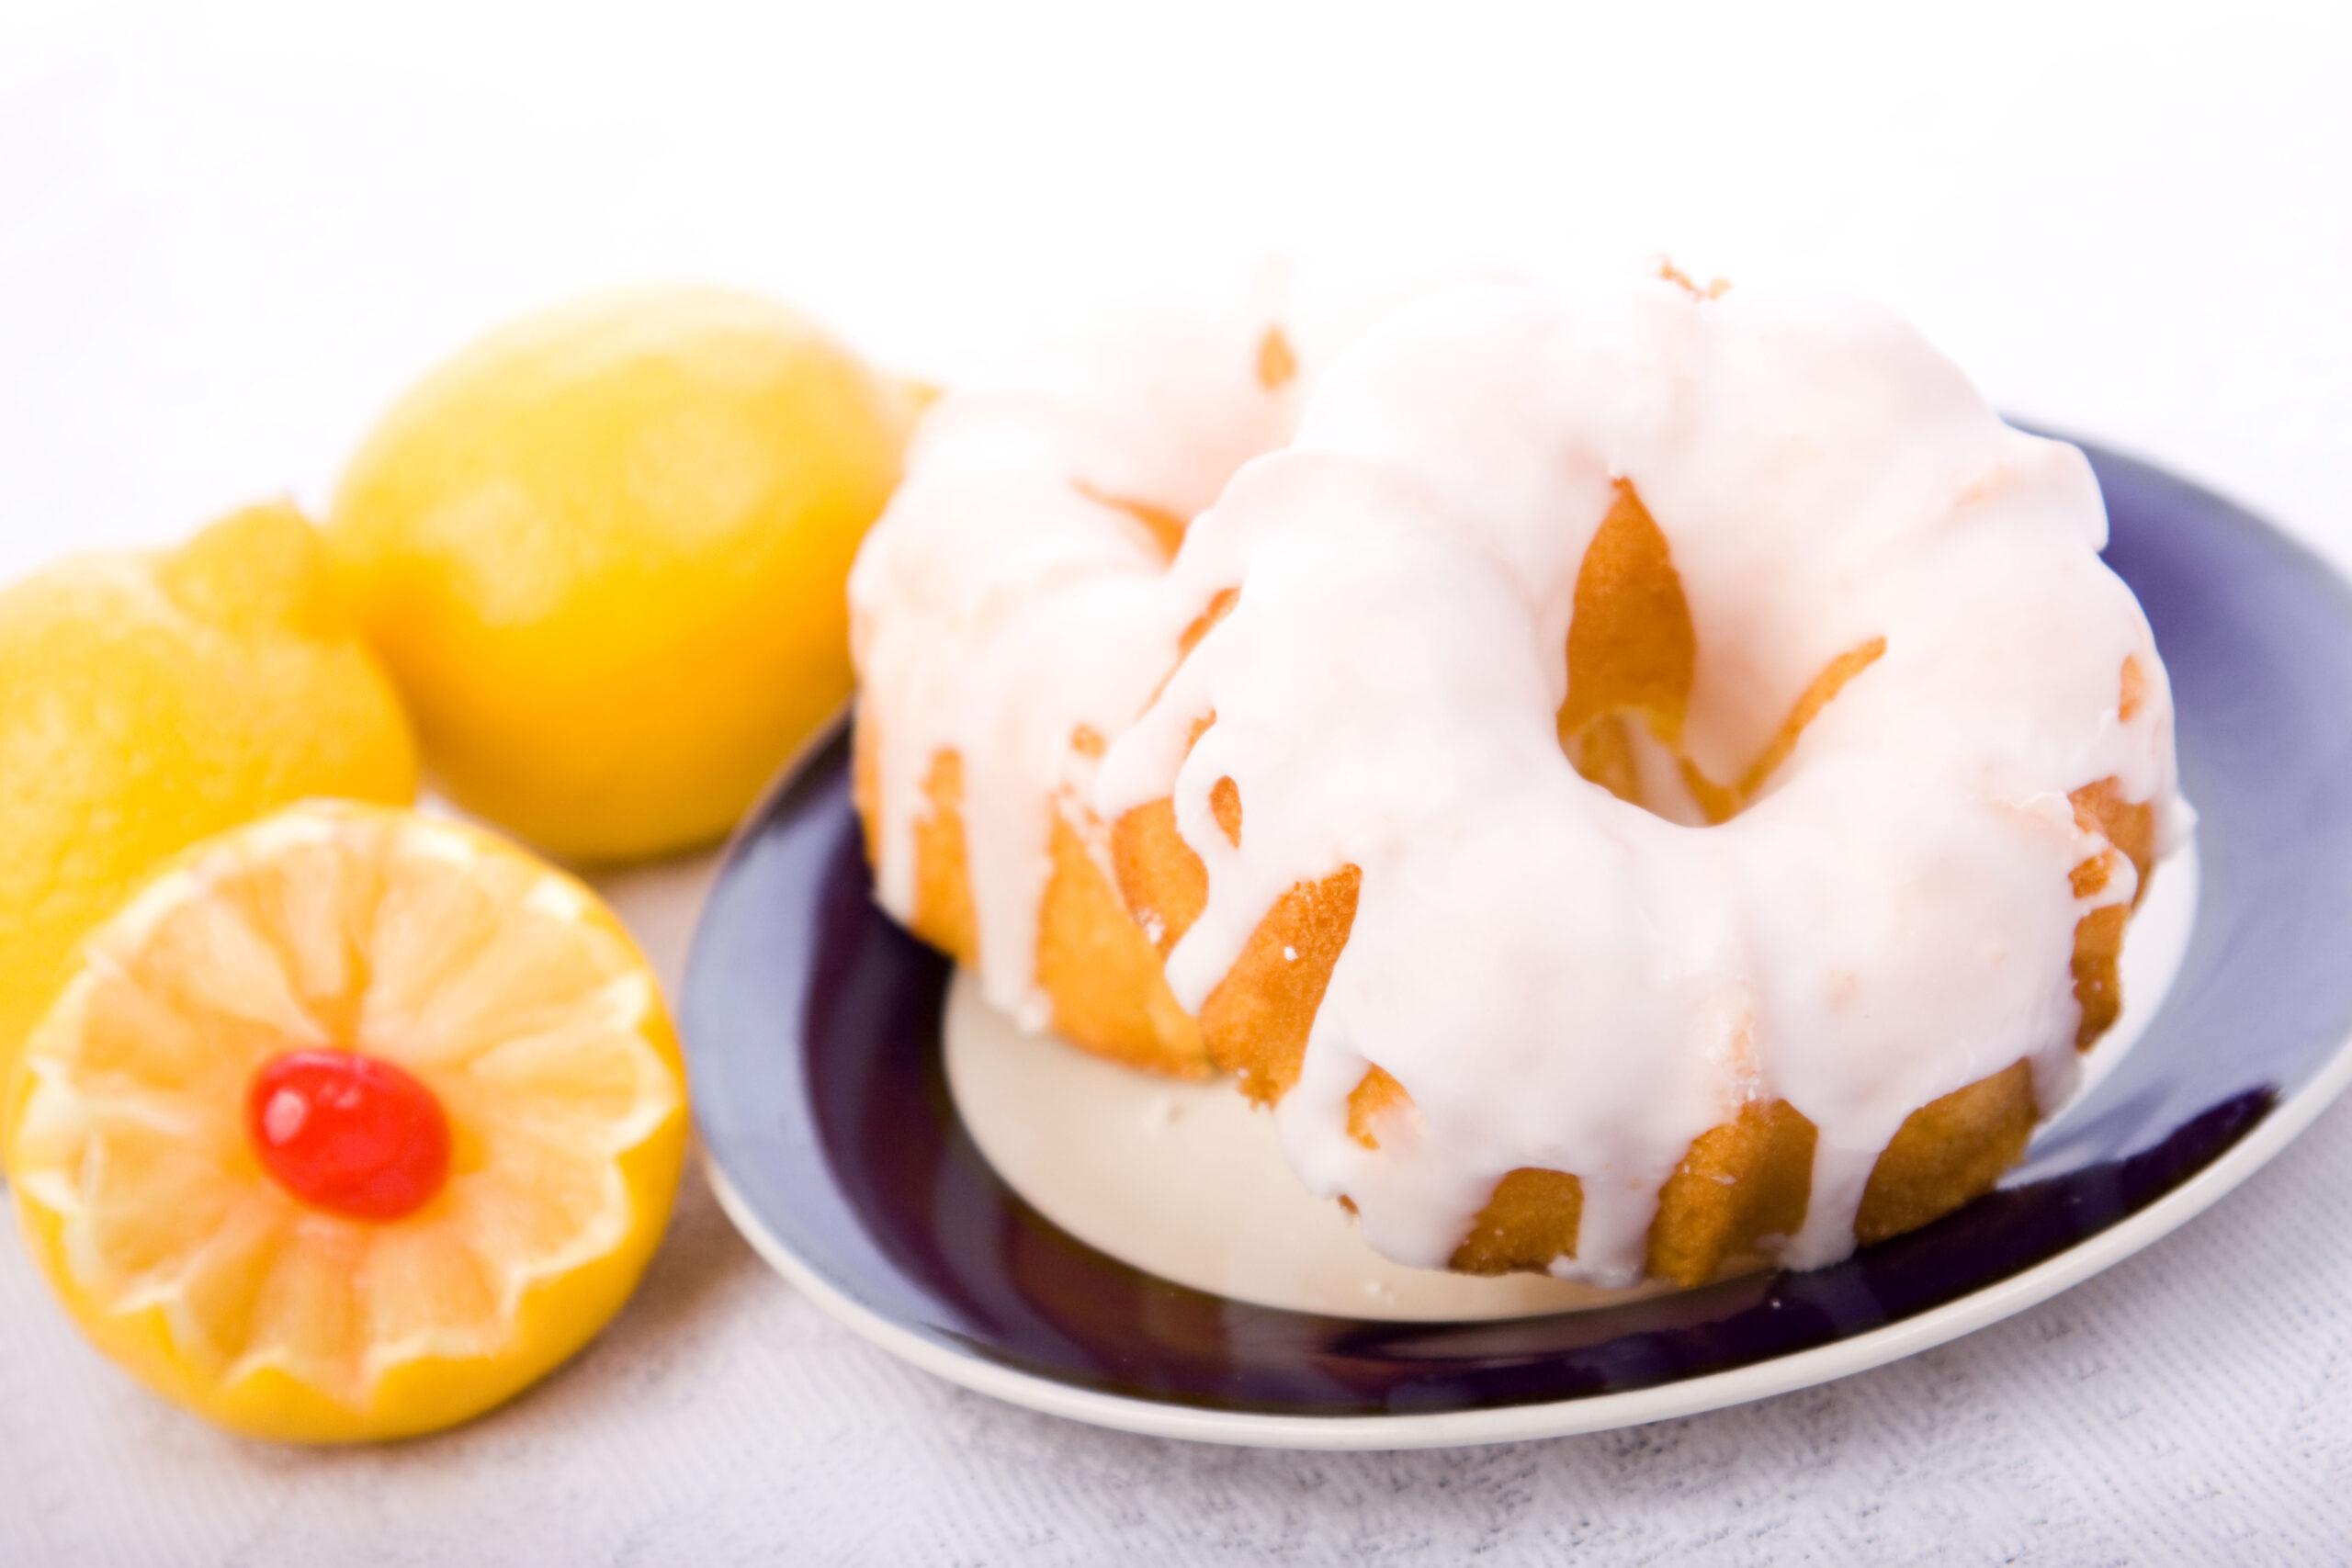 Fussell Cake Company Lemon Fussell Cake